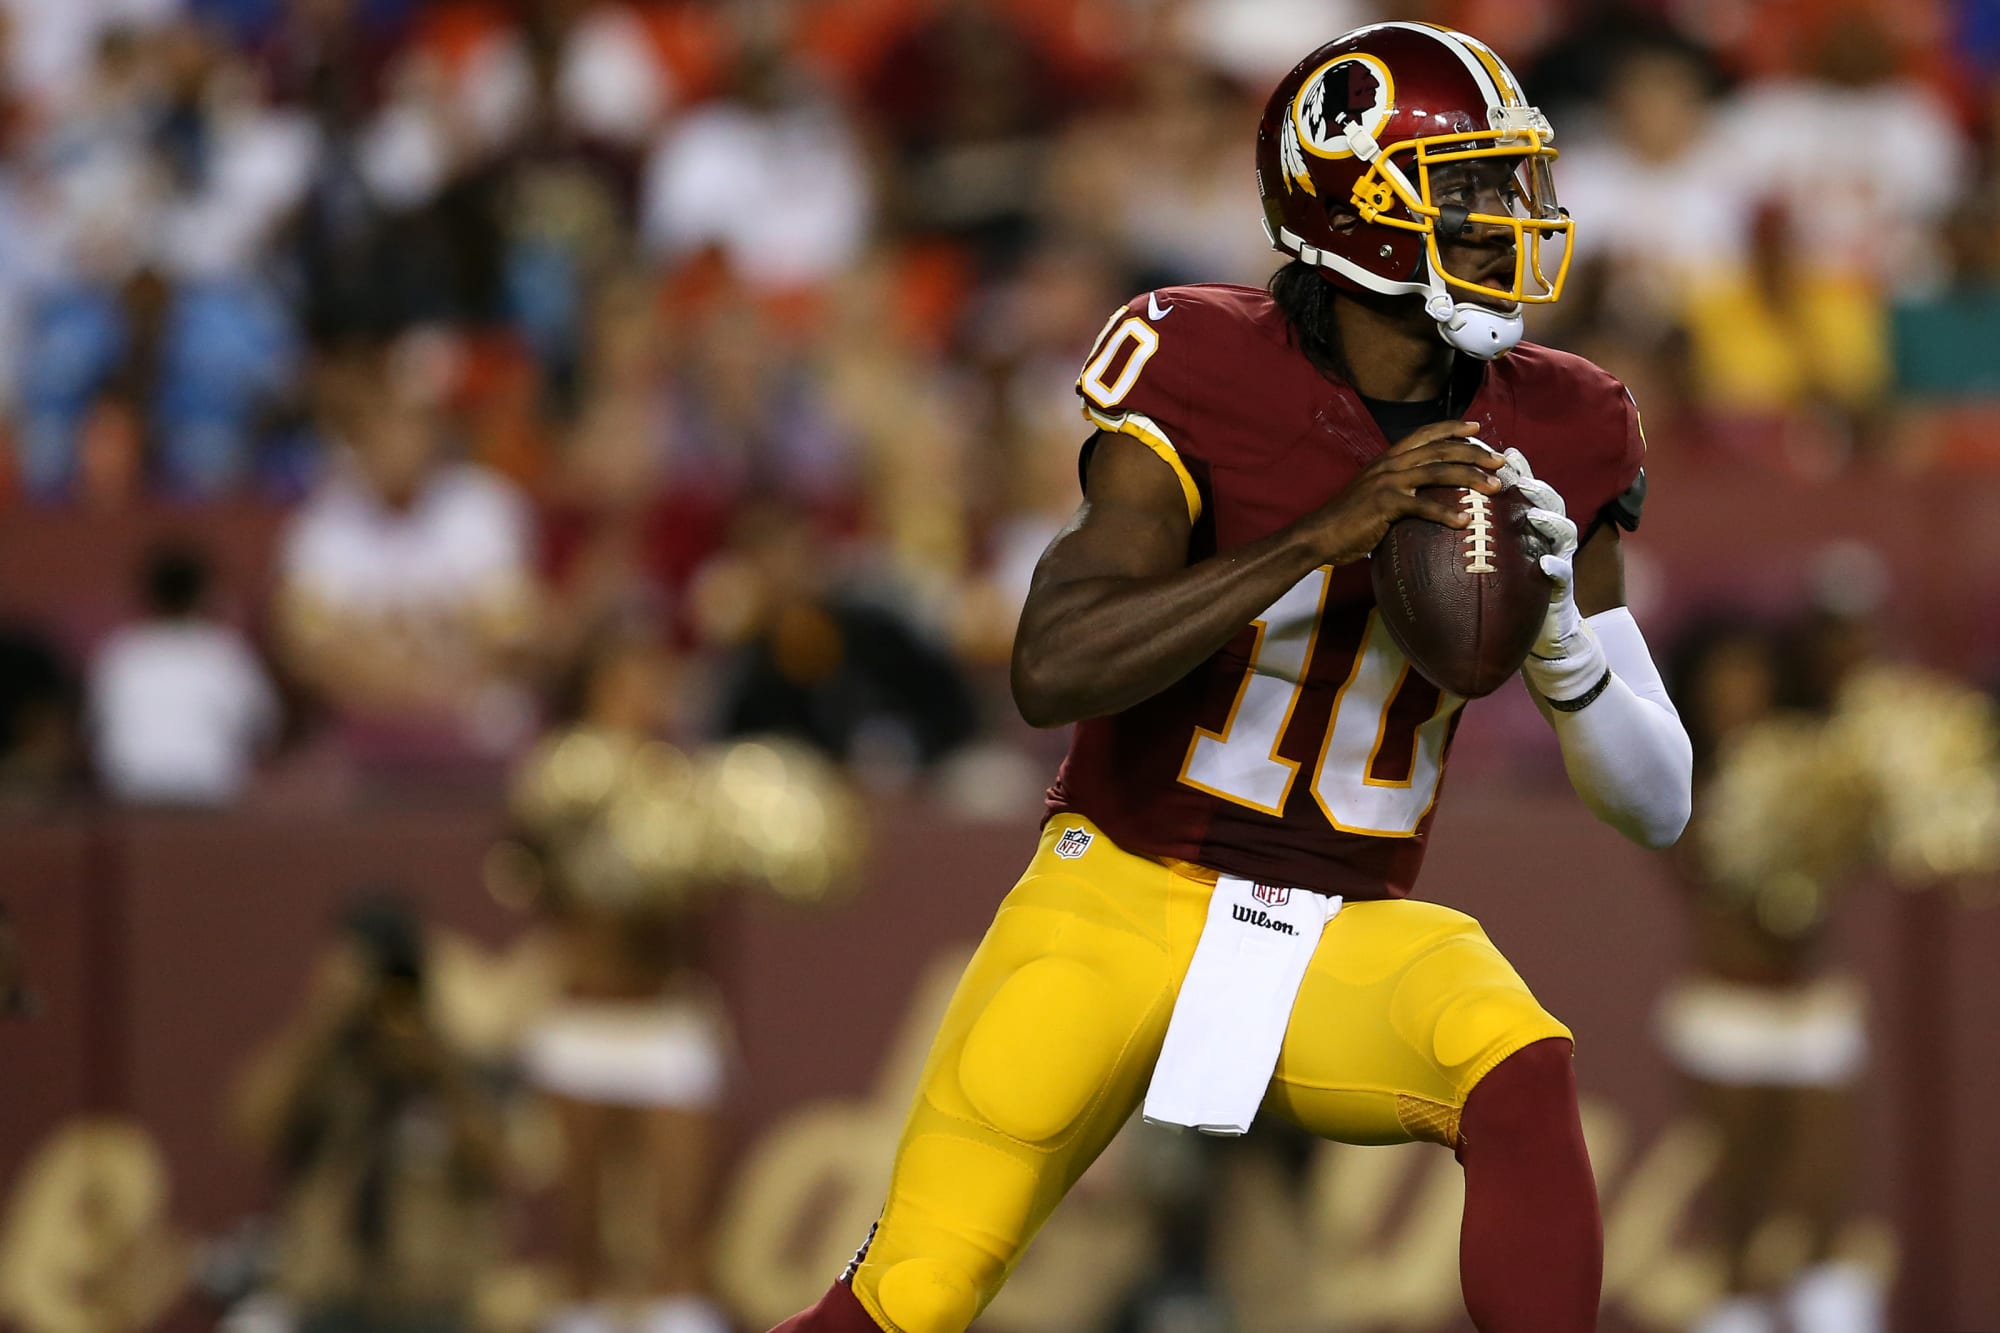 Six unsung plays from Washington Redskins history